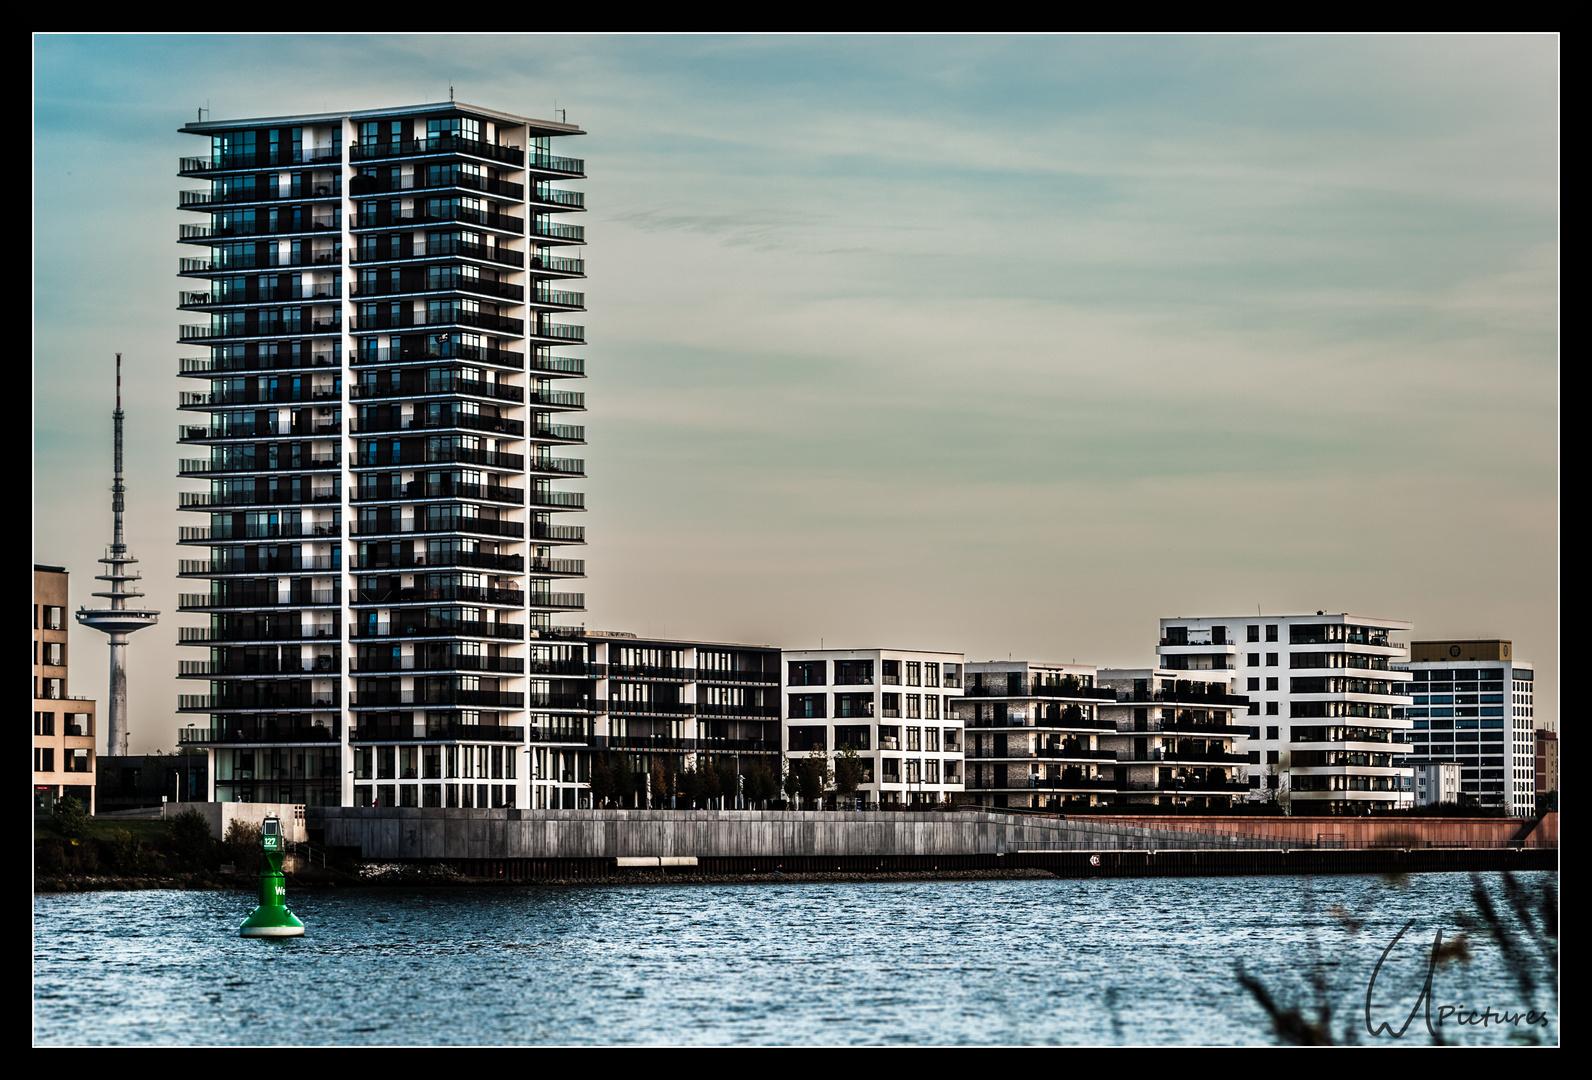 New Bremen